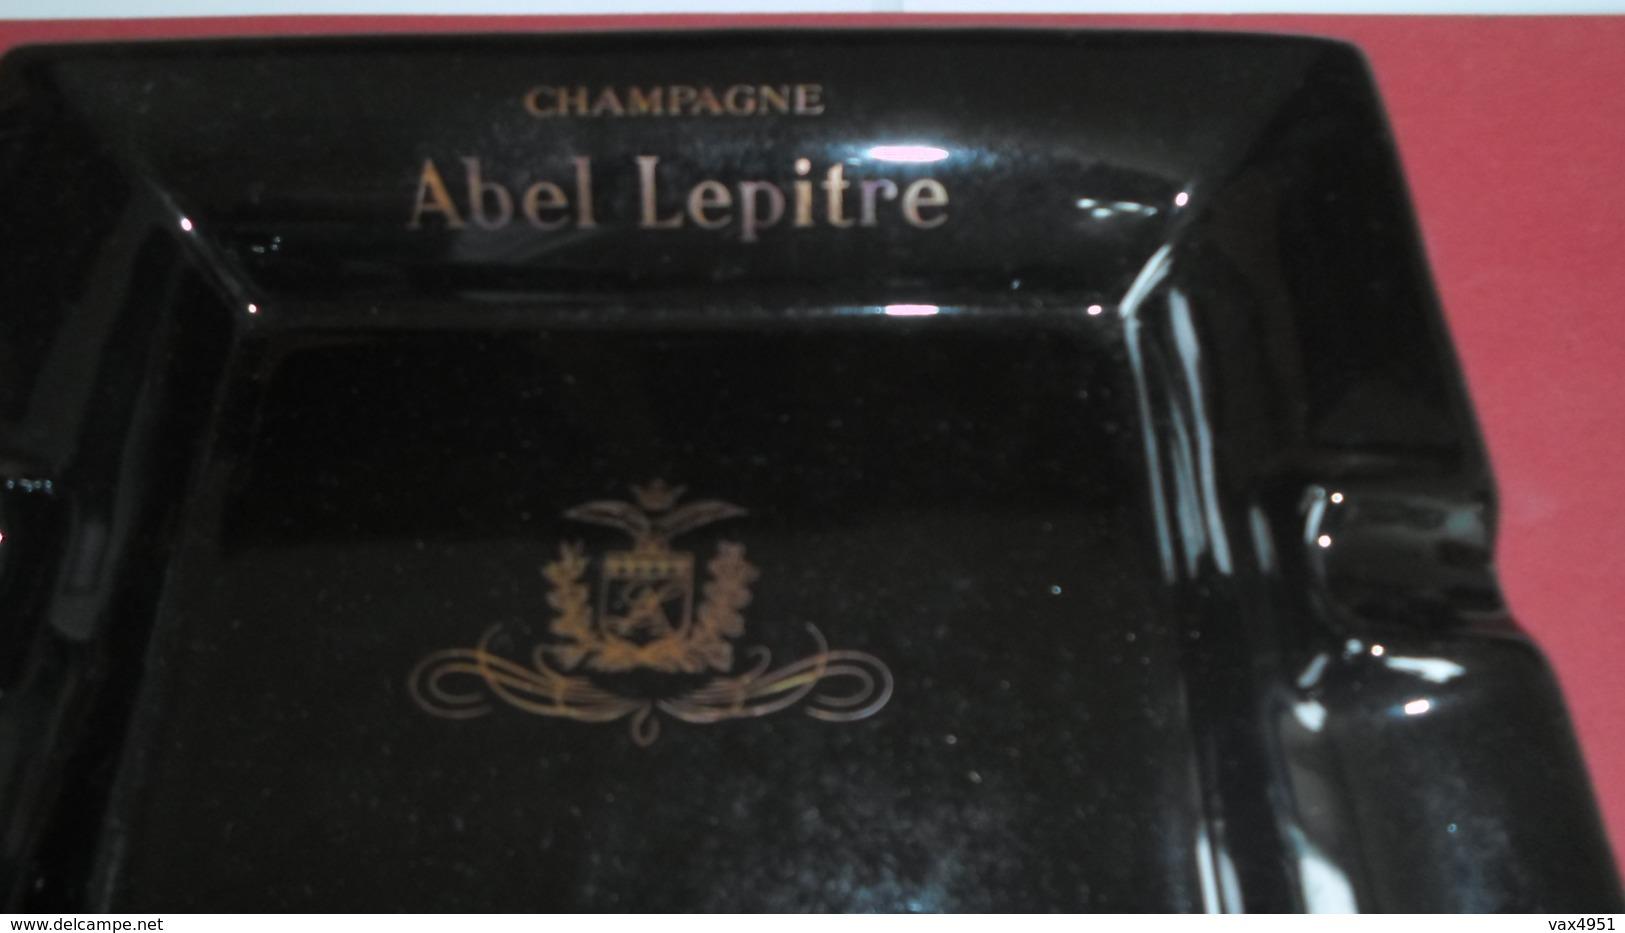 CENDRIER  CHAMPAGNE ABEL LEPITRE  NEUF DANS EMBALLAGE D ORIGINE  ****   RARE   A  SAISIR **** - Asbakken